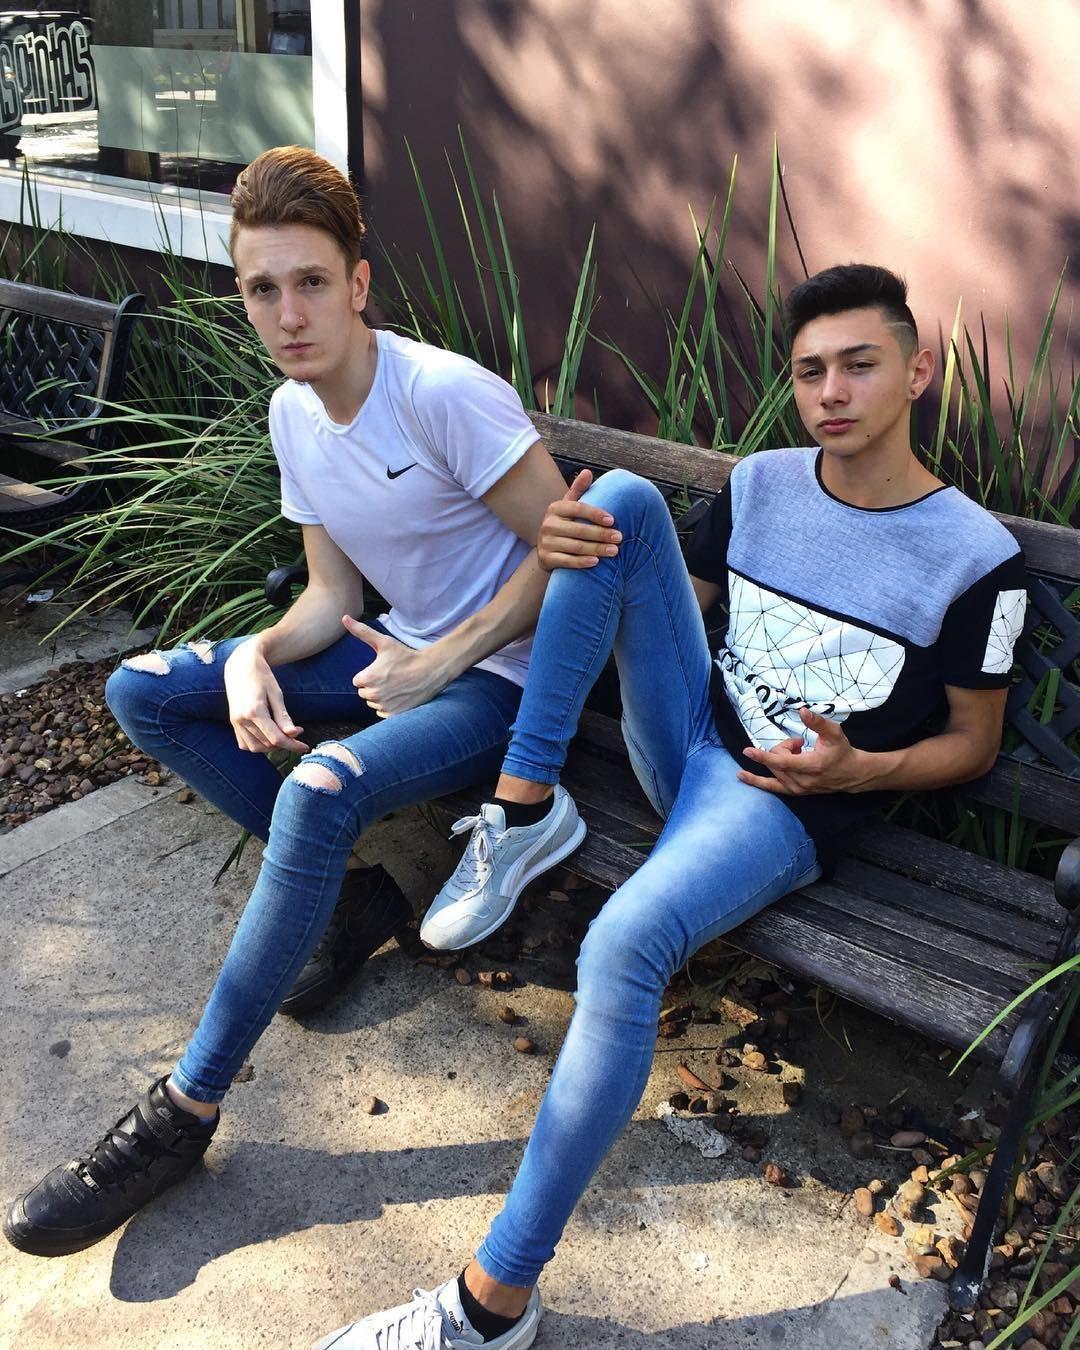 jeeroo equiza on instagram faltaba con vos hermano instagram mensjeansslim nice legs. Black Bedroom Furniture Sets. Home Design Ideas